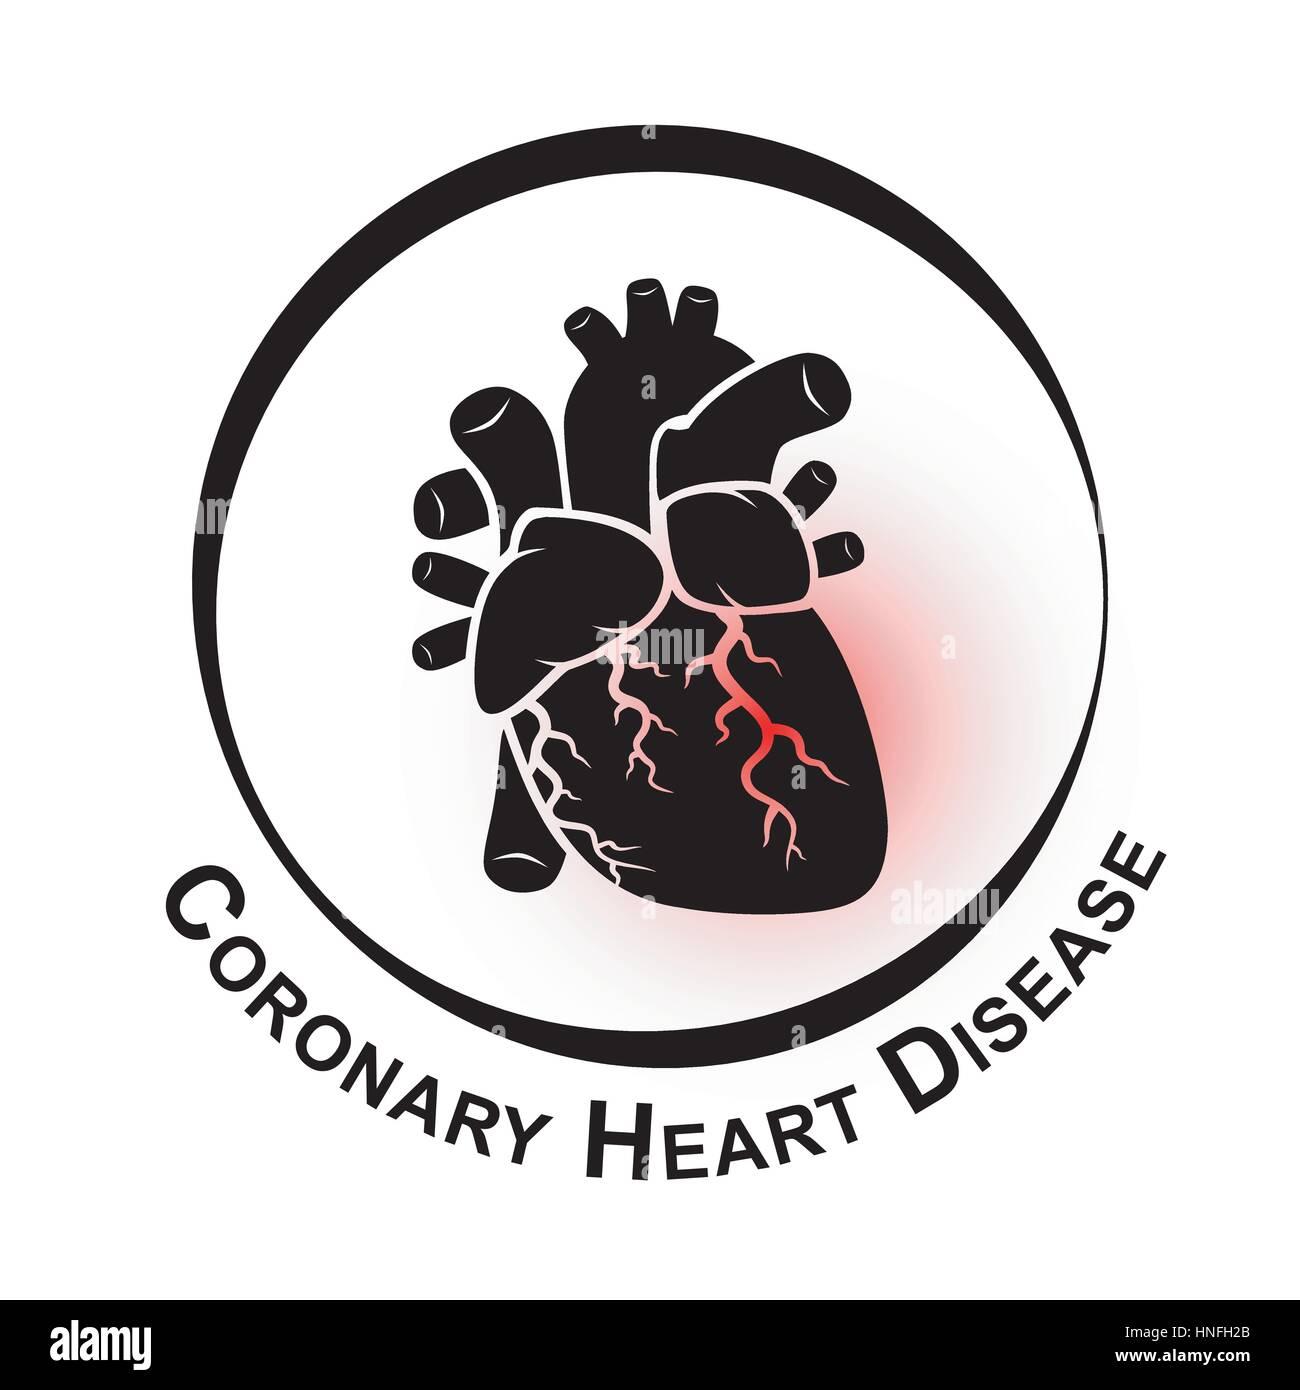 Coronary Heart Disease Symbol Ischemic Heart Disease Myocardial